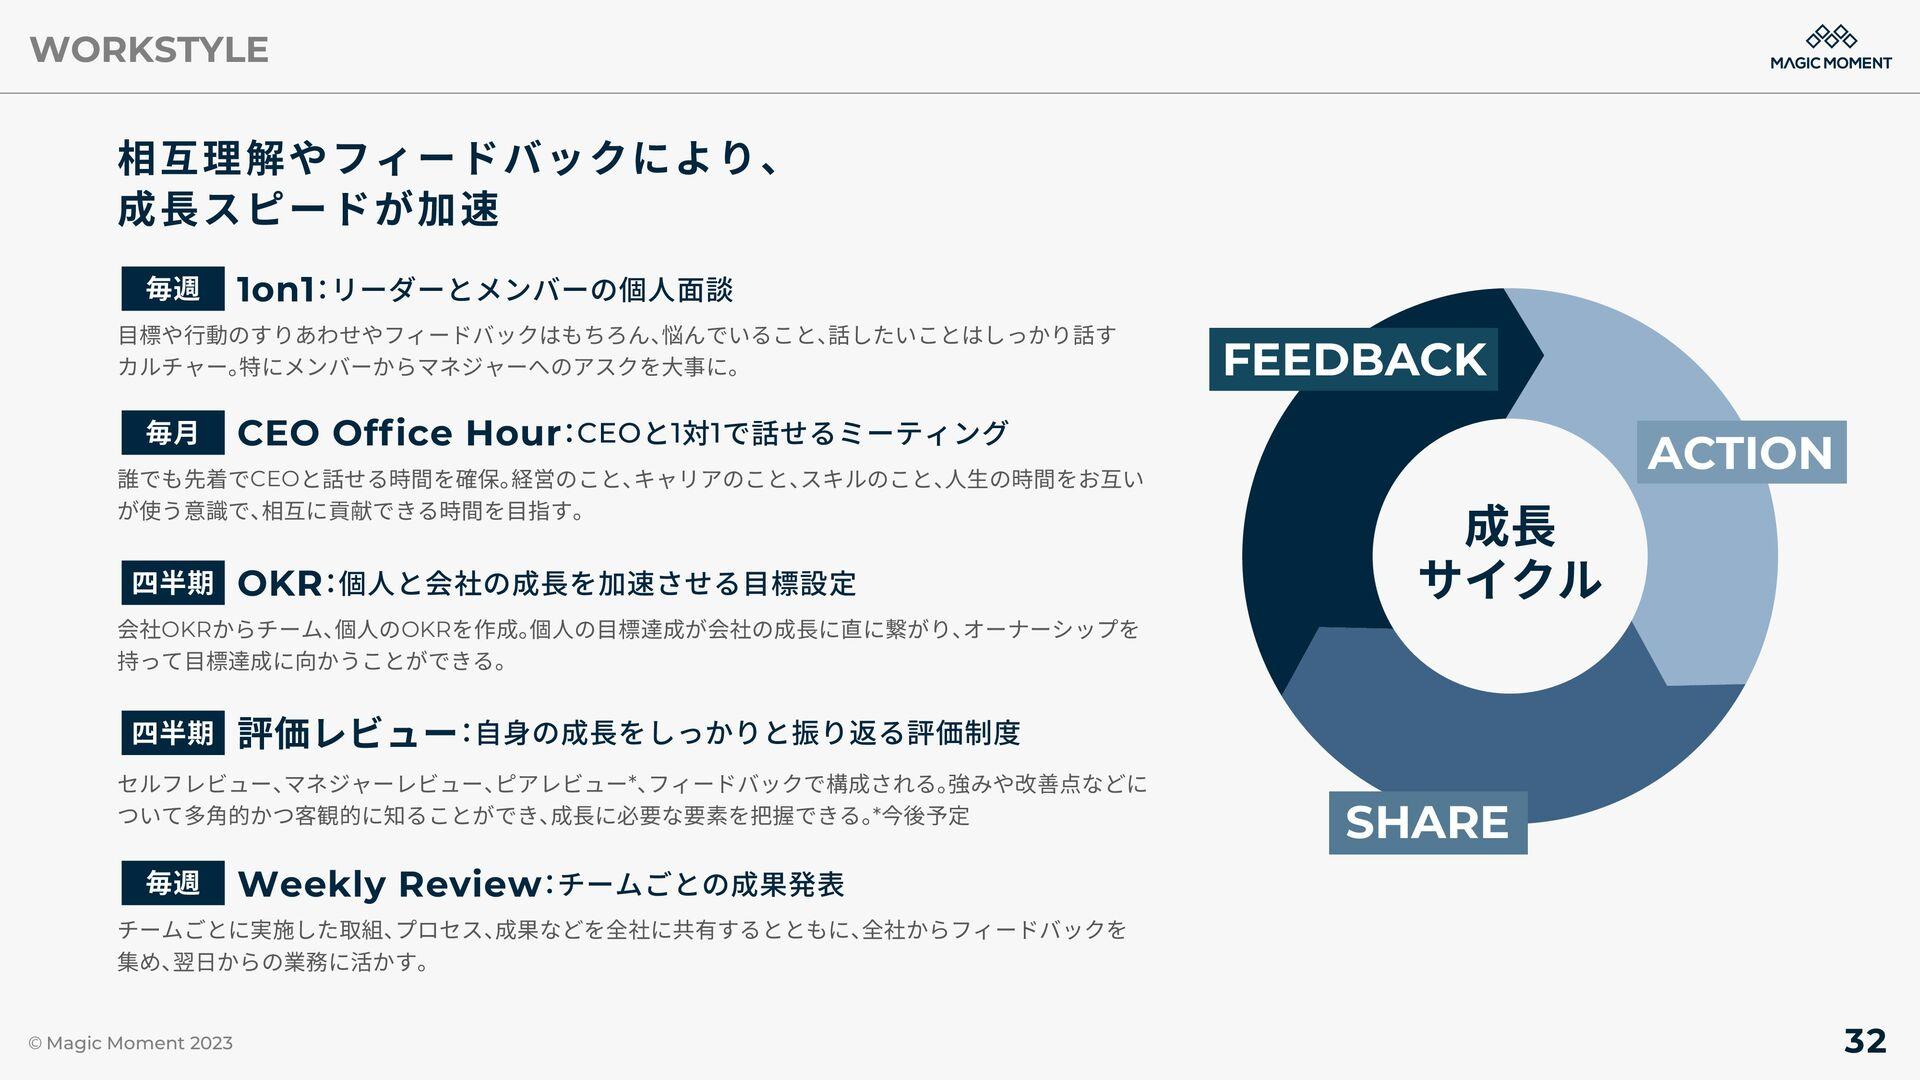 WORKSTYLE 社内イベント等、 定期的にメンバー同士の交流をはかるイベントを実施 TGI...